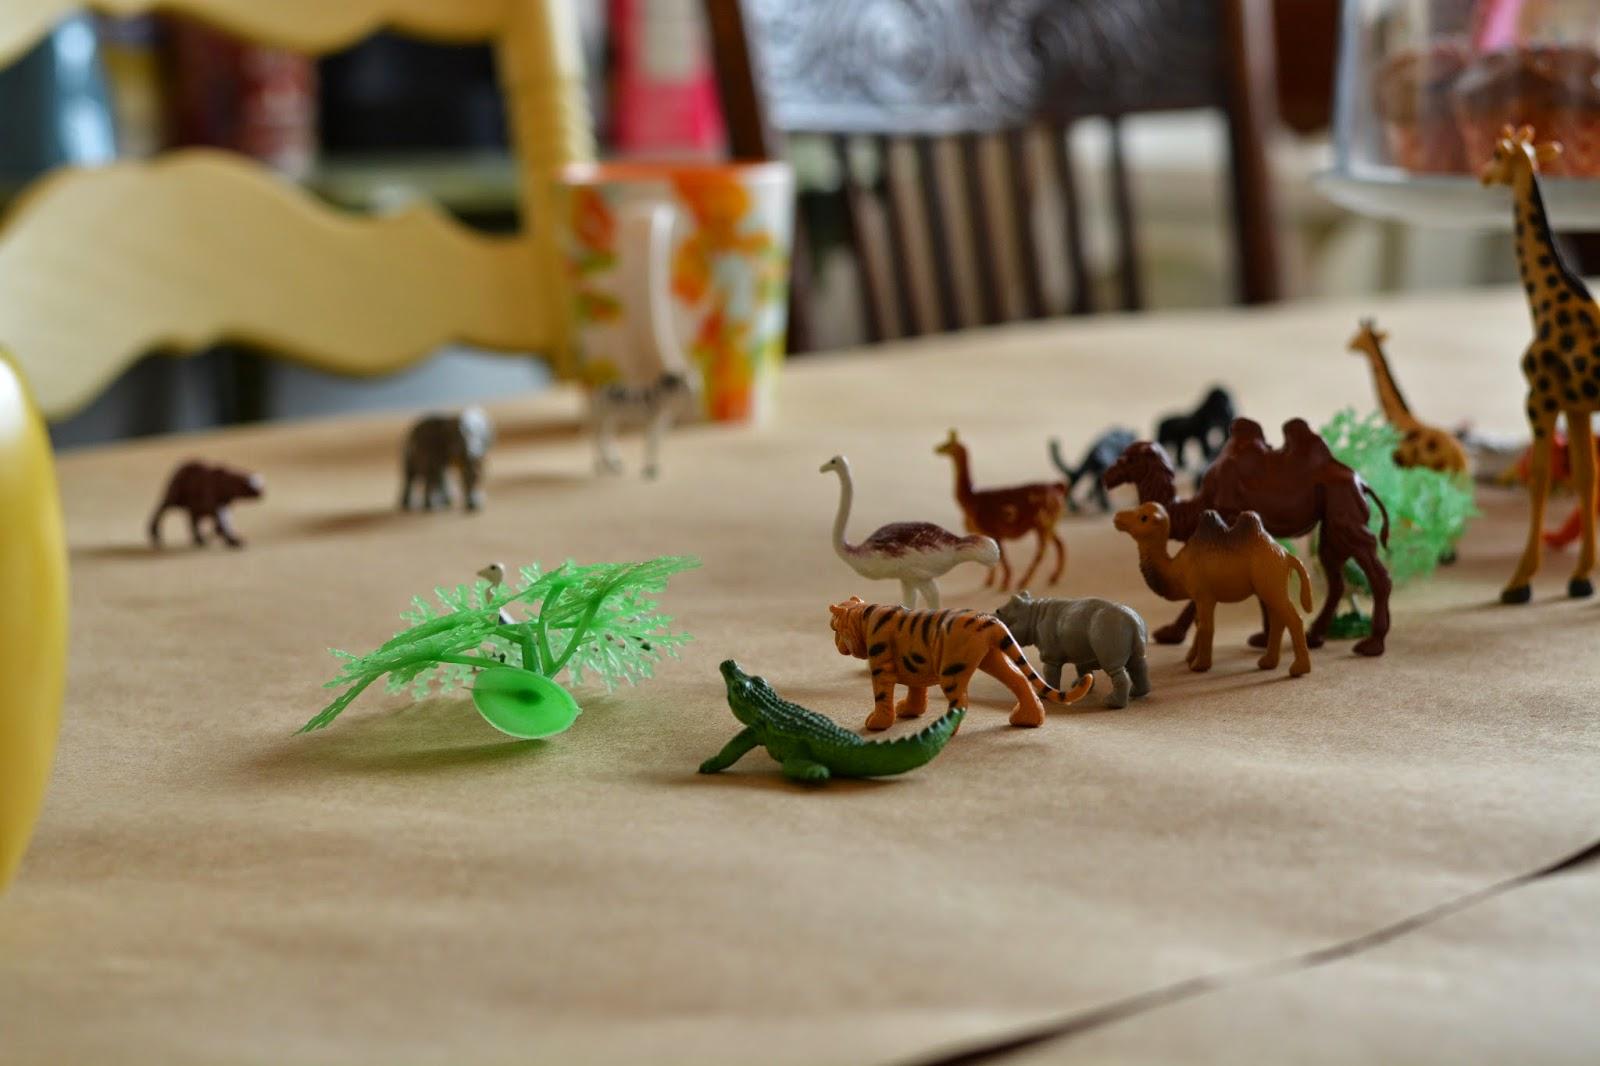 plastic zoo animals on table.